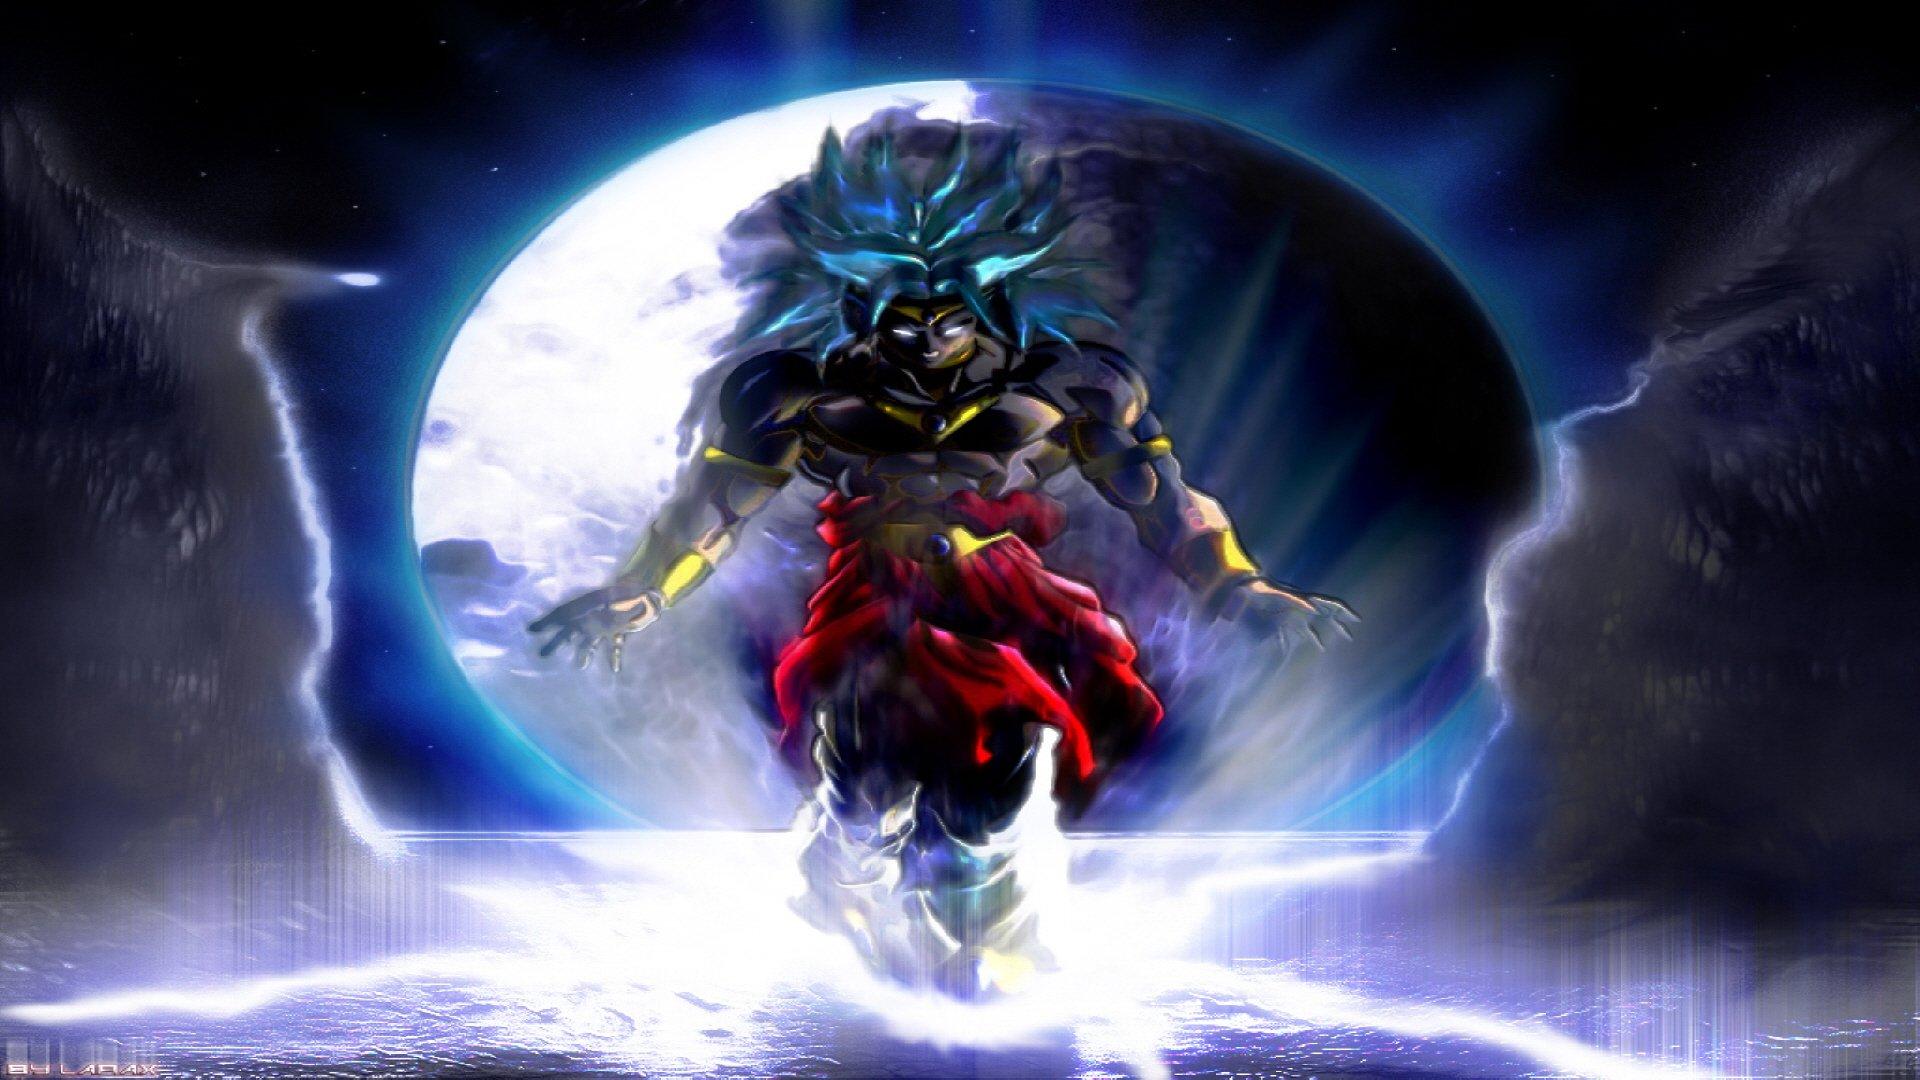 dragon ball z full hd wallpaper free download